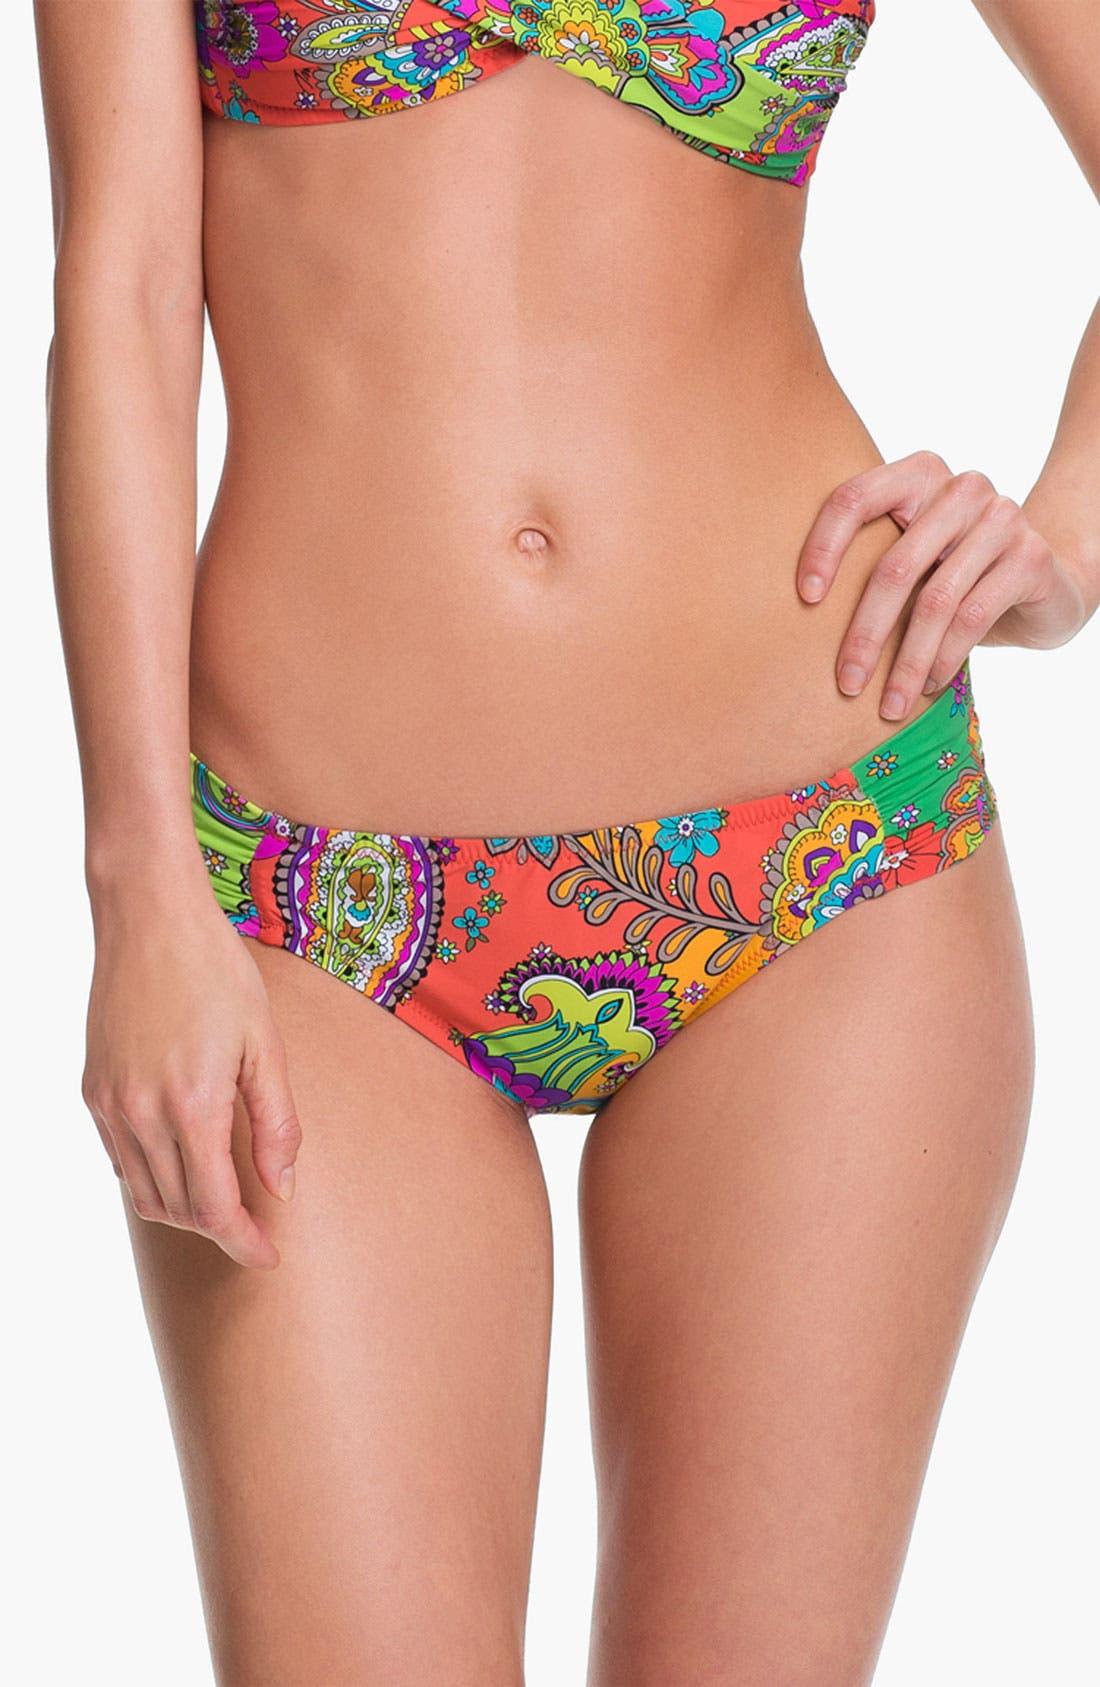 Alternate Image 1 Selected - Trina Turk 'Summer of Love' Hipster Bikini Bottoms